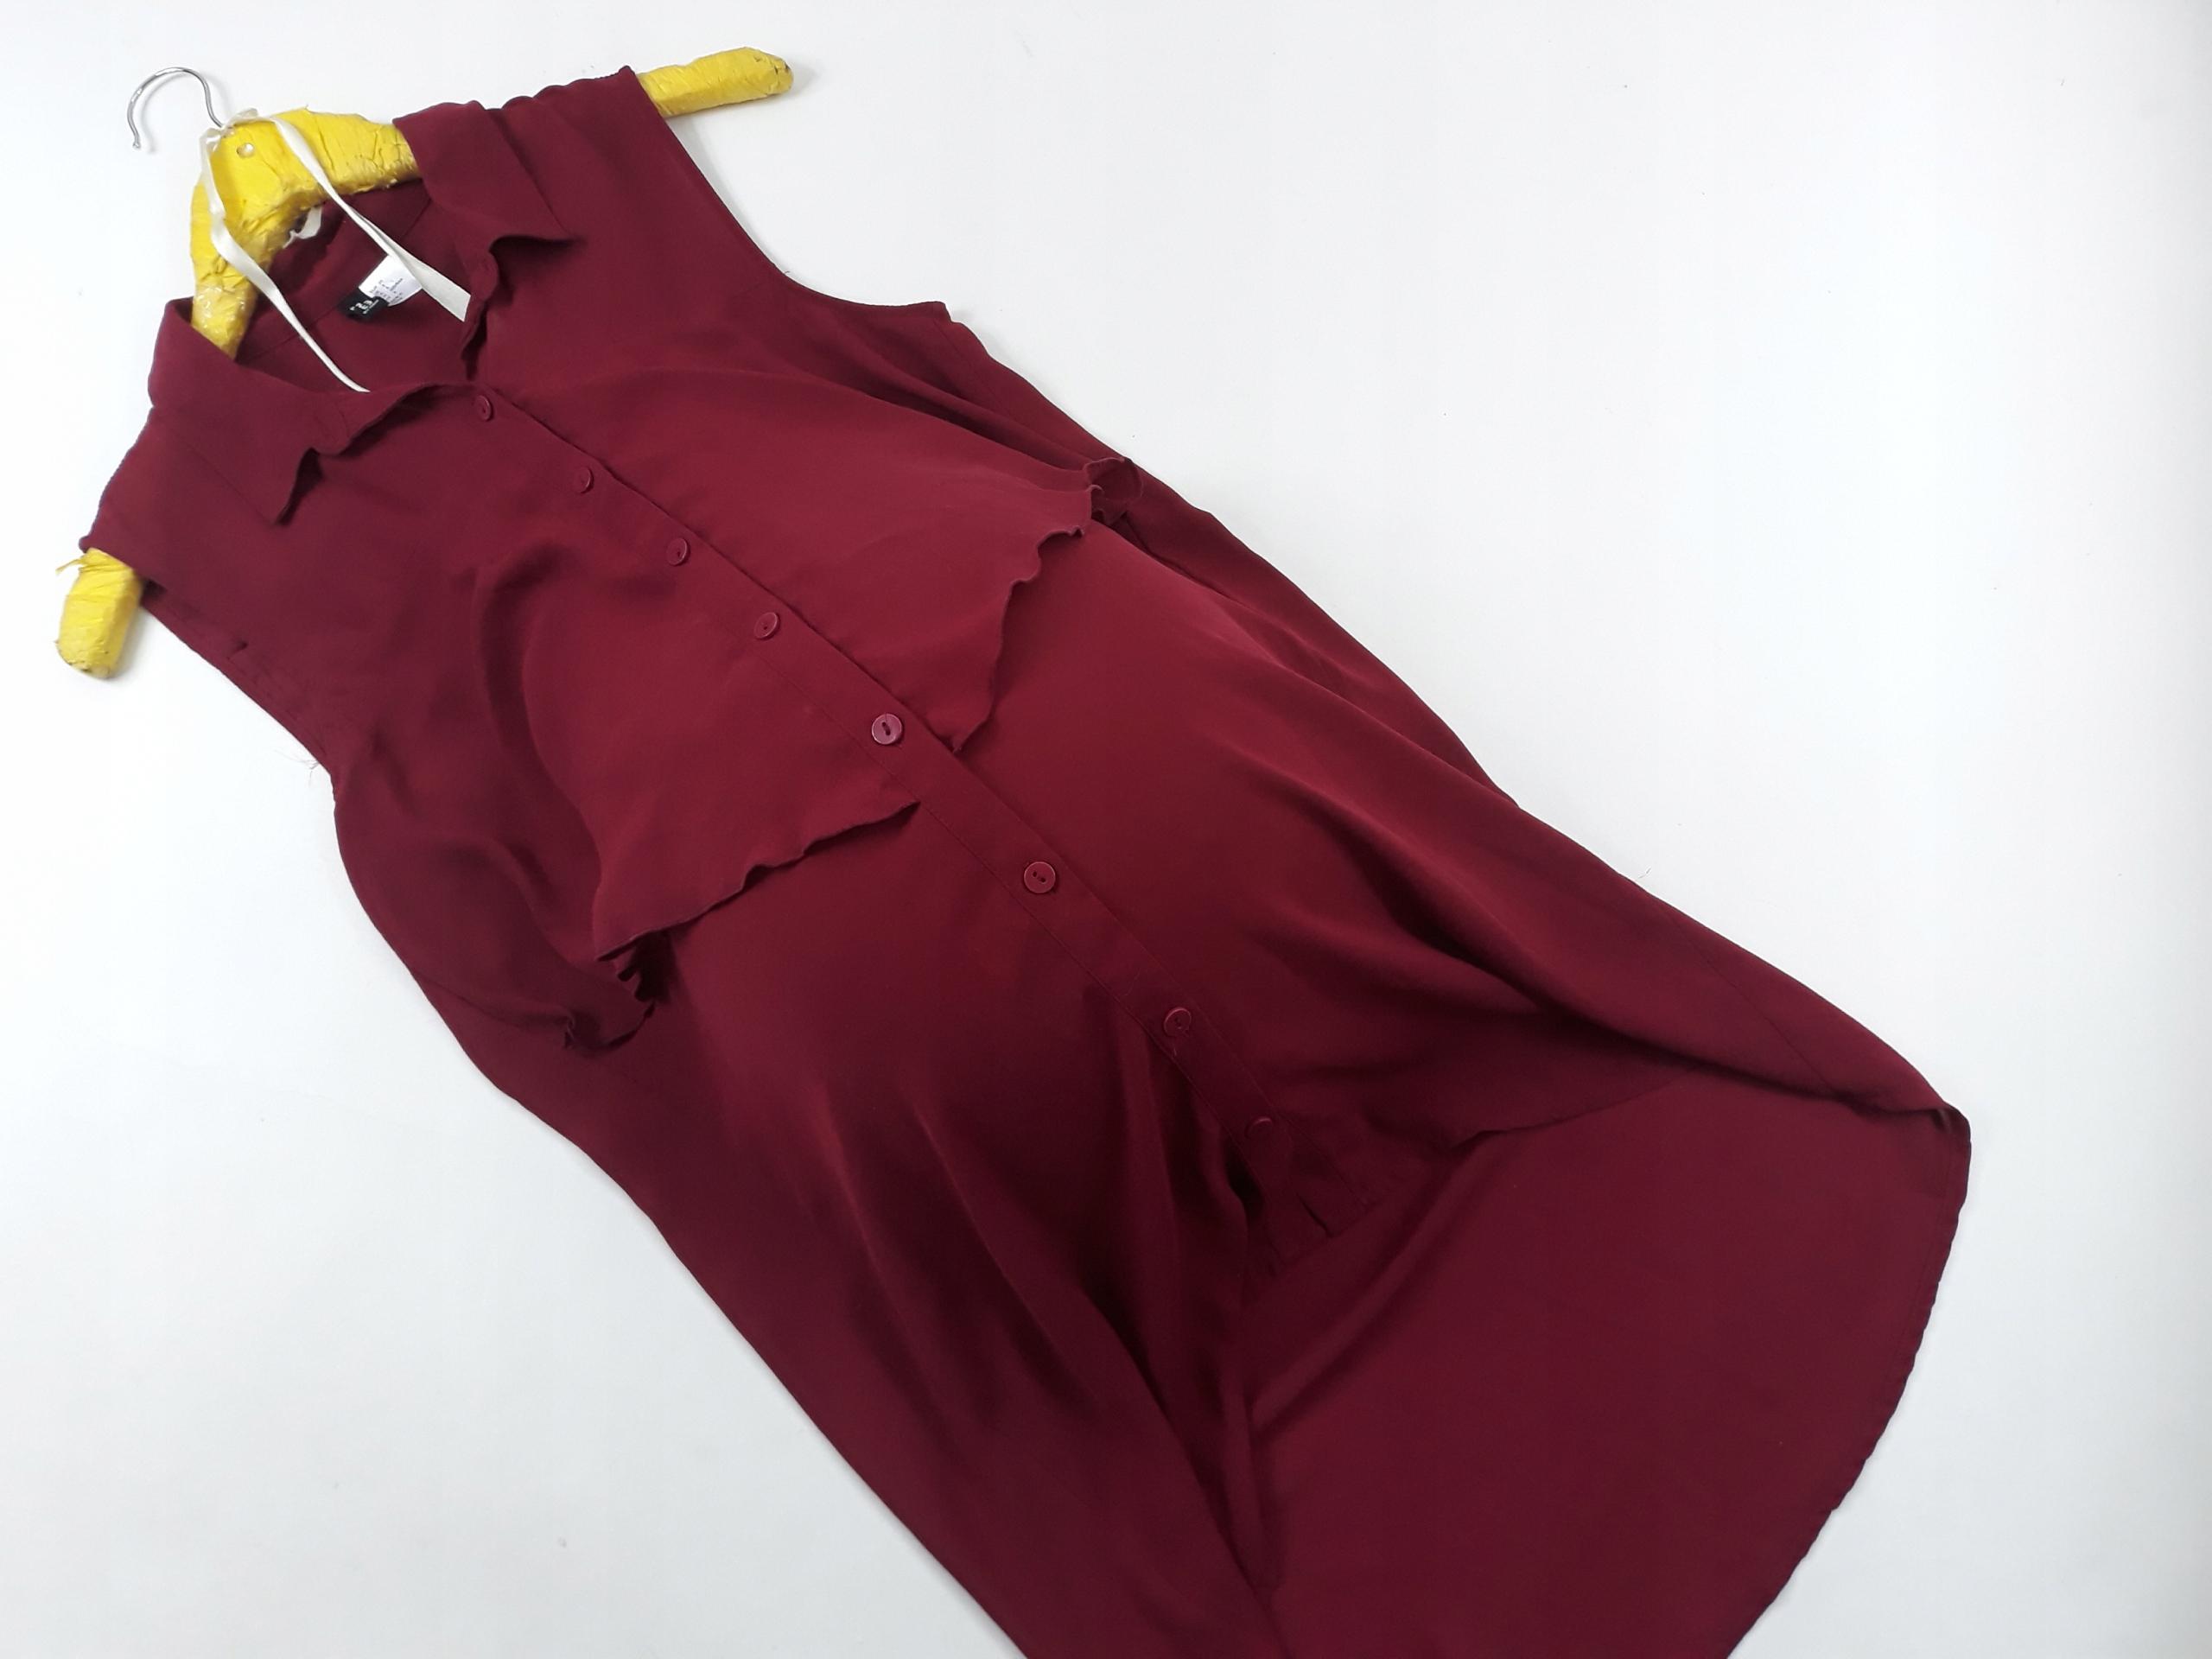 DIVIDED H&M * 36 * Tunika ciążowa na guziki *